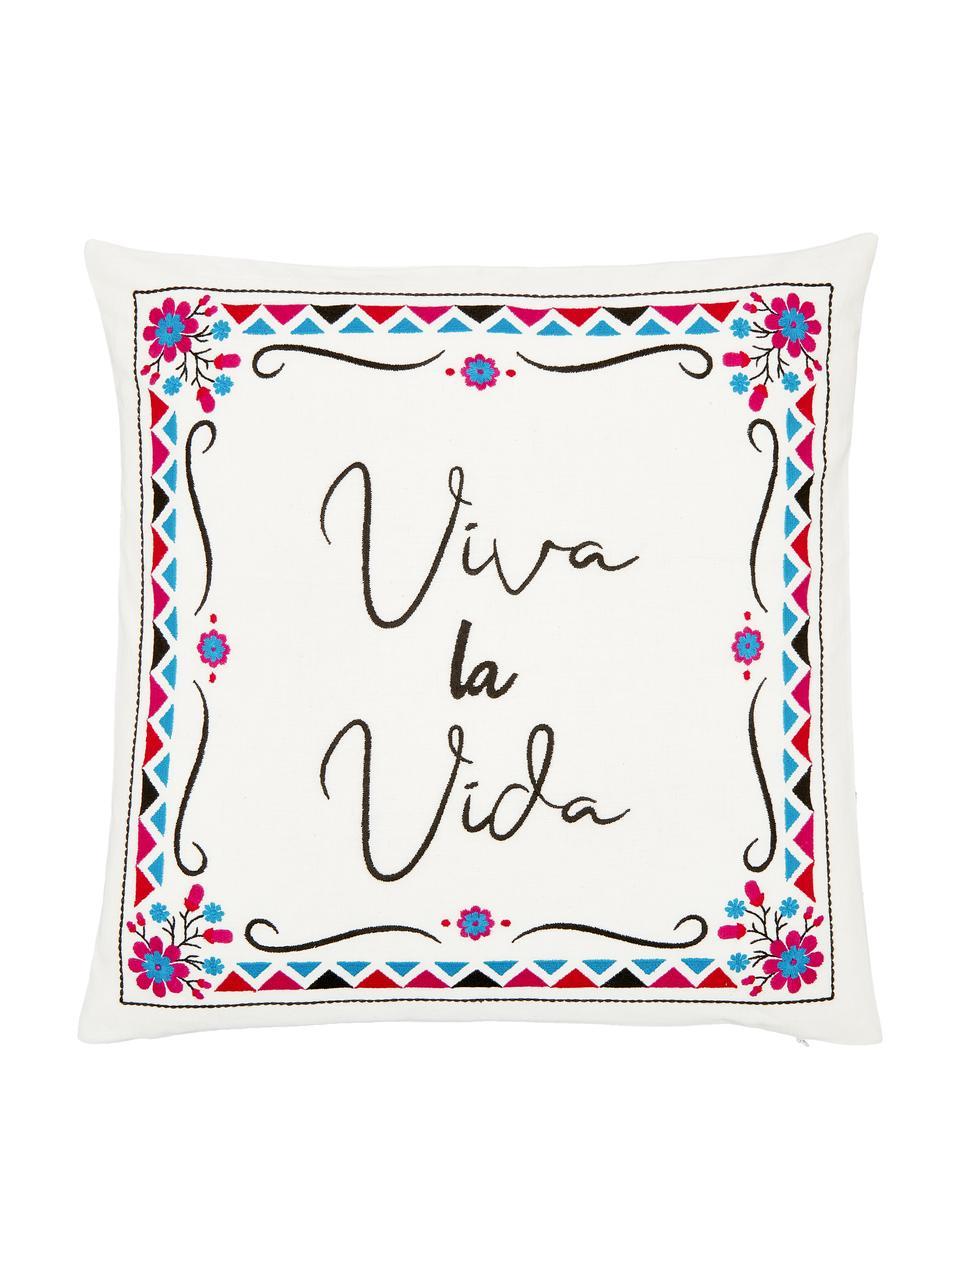 Bunt bestickte Kissenhülle Viva la Vida, 100% Baumwolle, Cremeweiß, Mehrfarbig, 45 x 45 cm